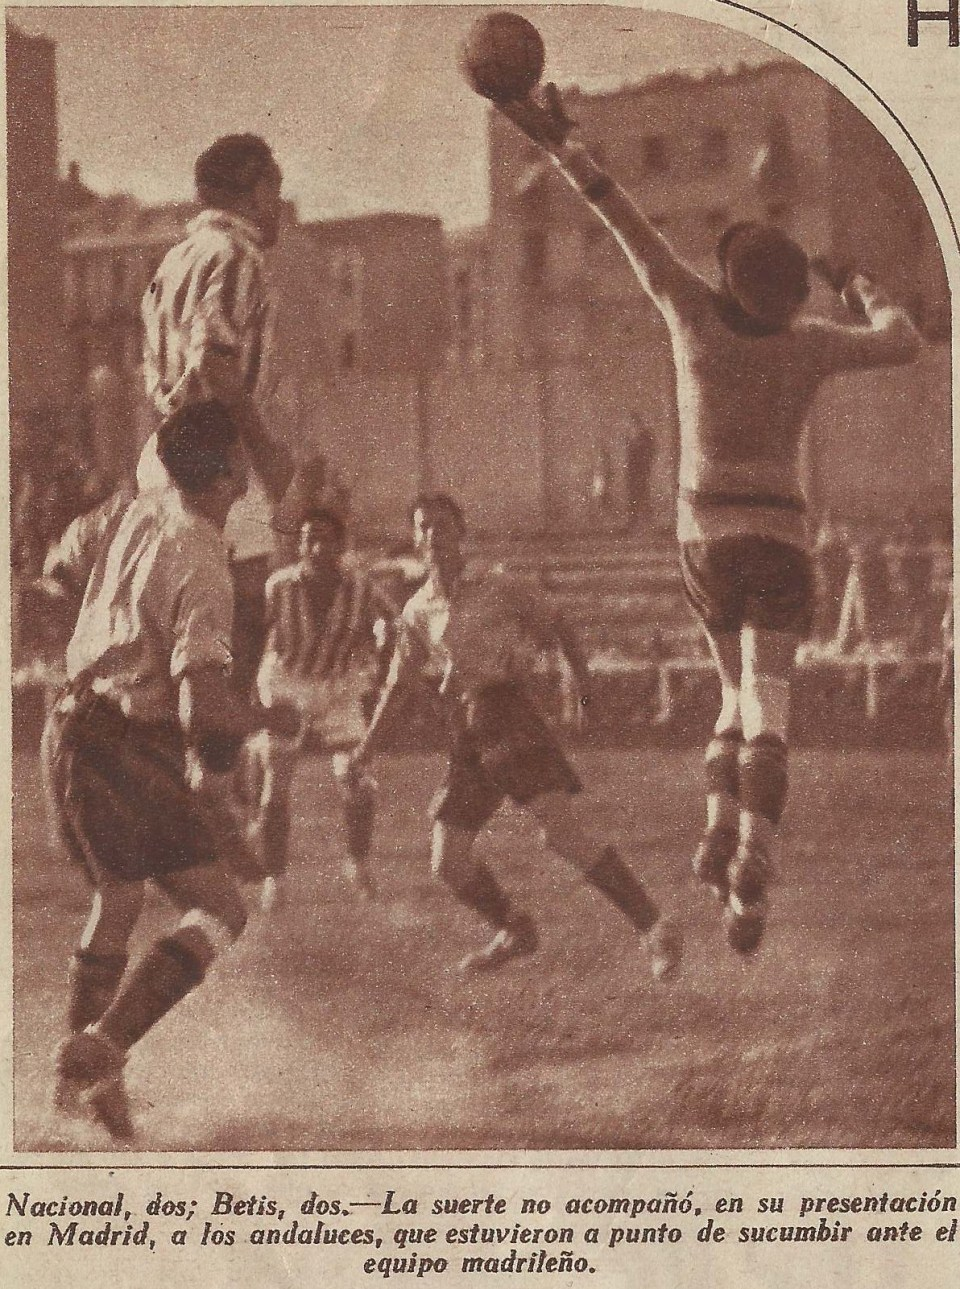 Fuente.-Revista Gráfica-Madrid 19330909.-Fotógrafo Contreras.